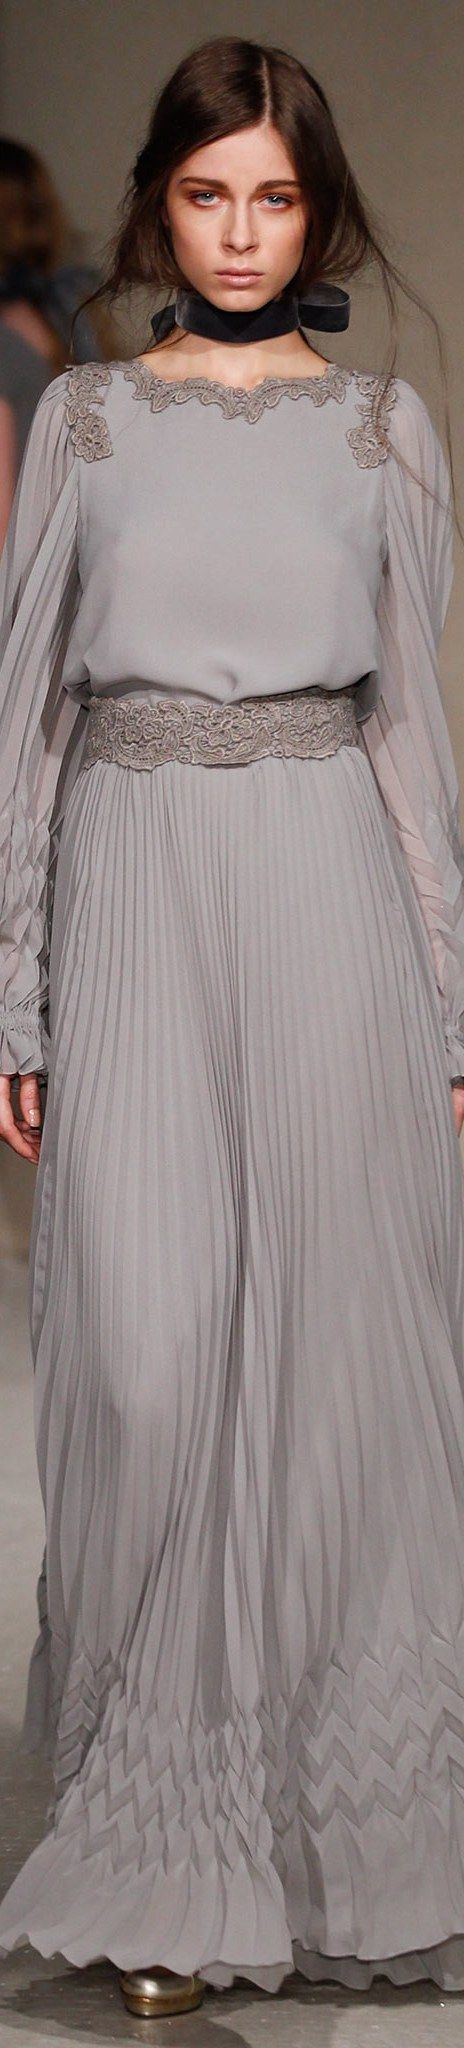 Luisa Beccaria - Fall 2015